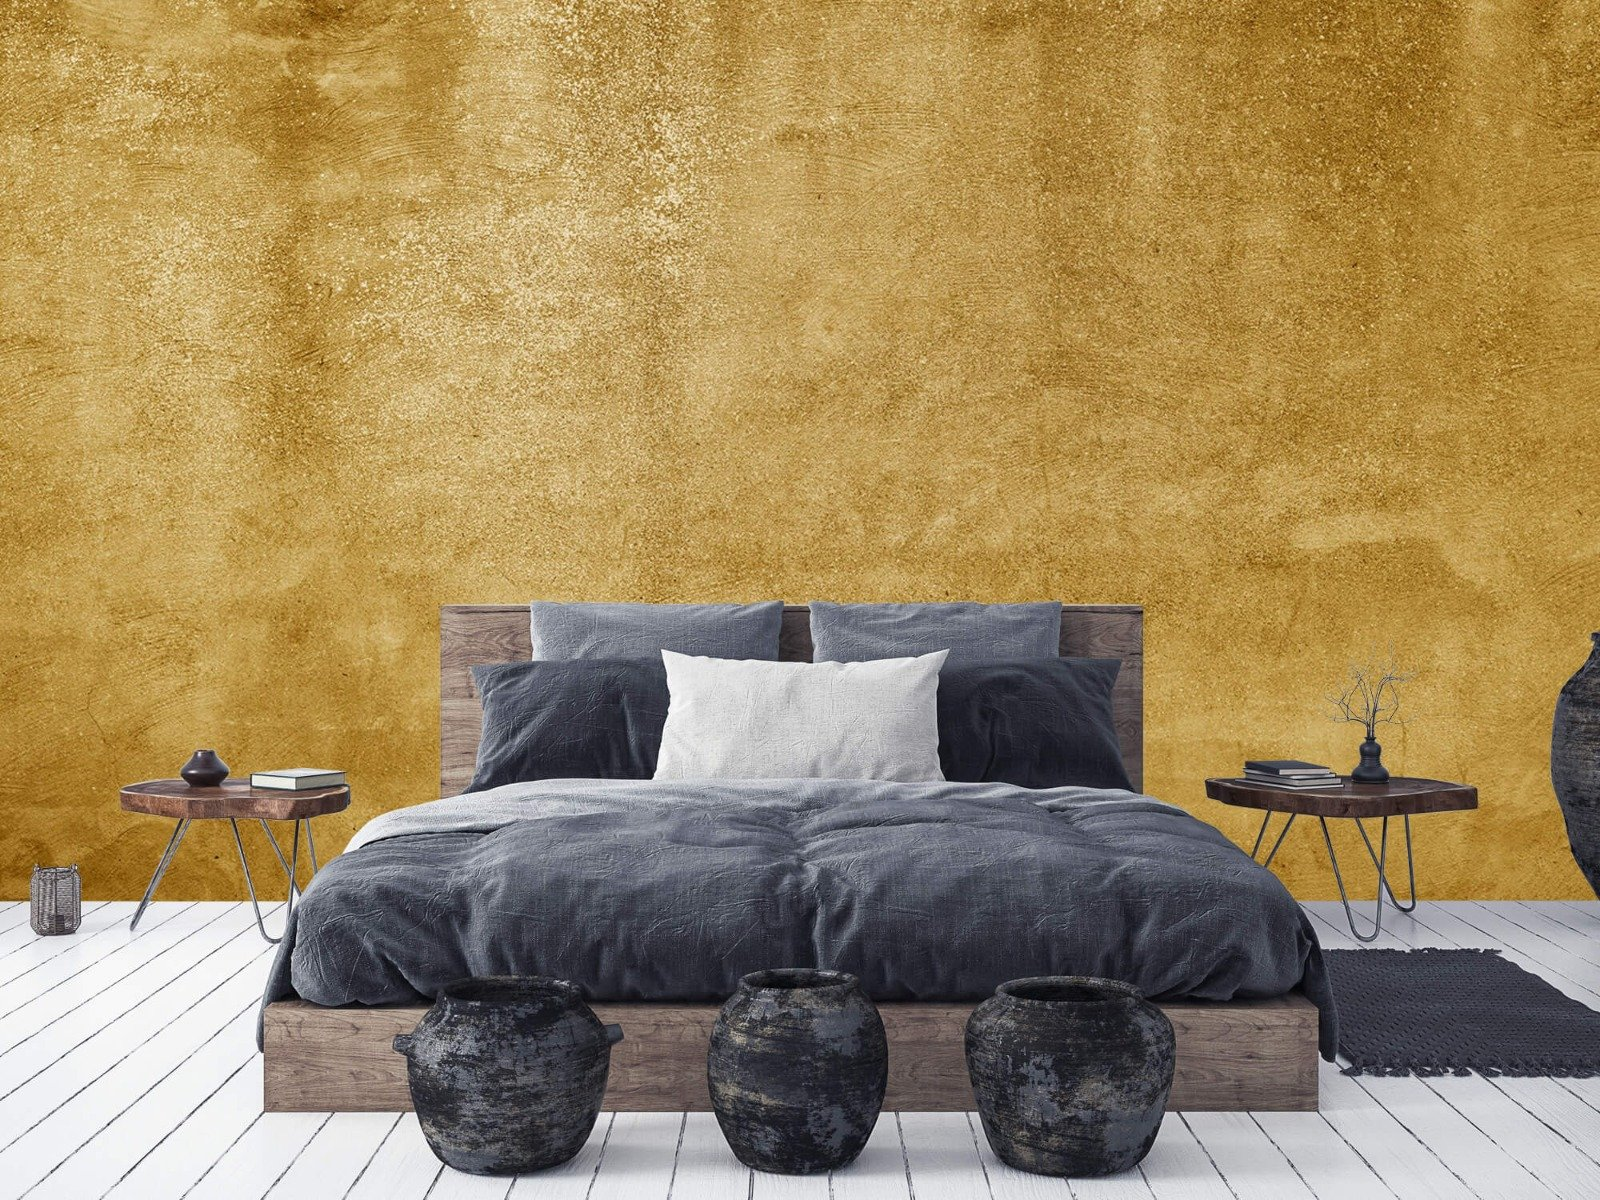 Betonlook behang - Oker geel beton - Woonkamer 2